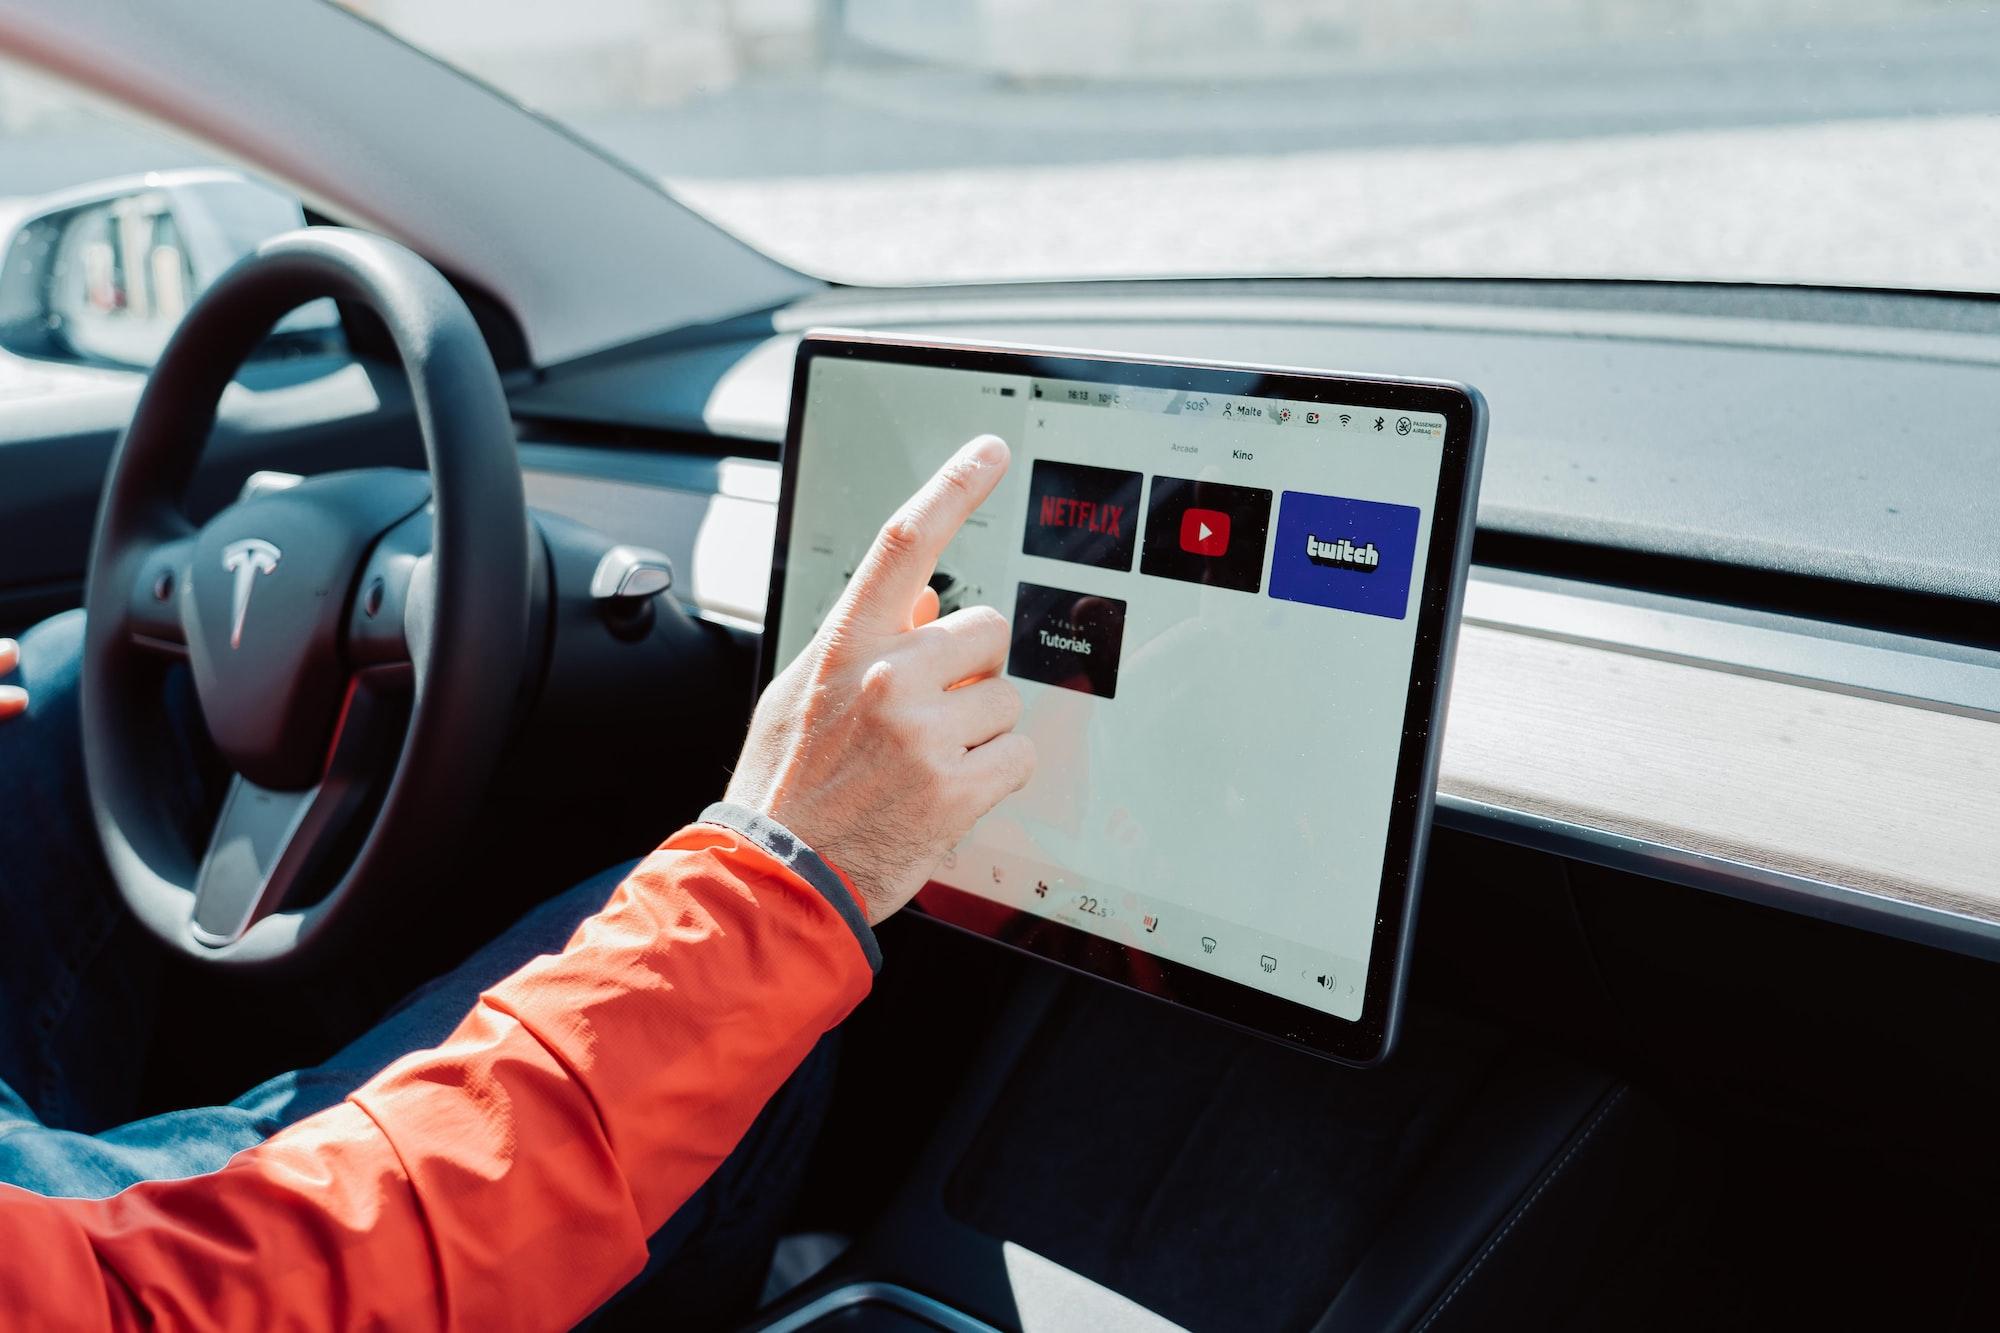 Man in orange jacket is sitting in Tesla and using Tesla app